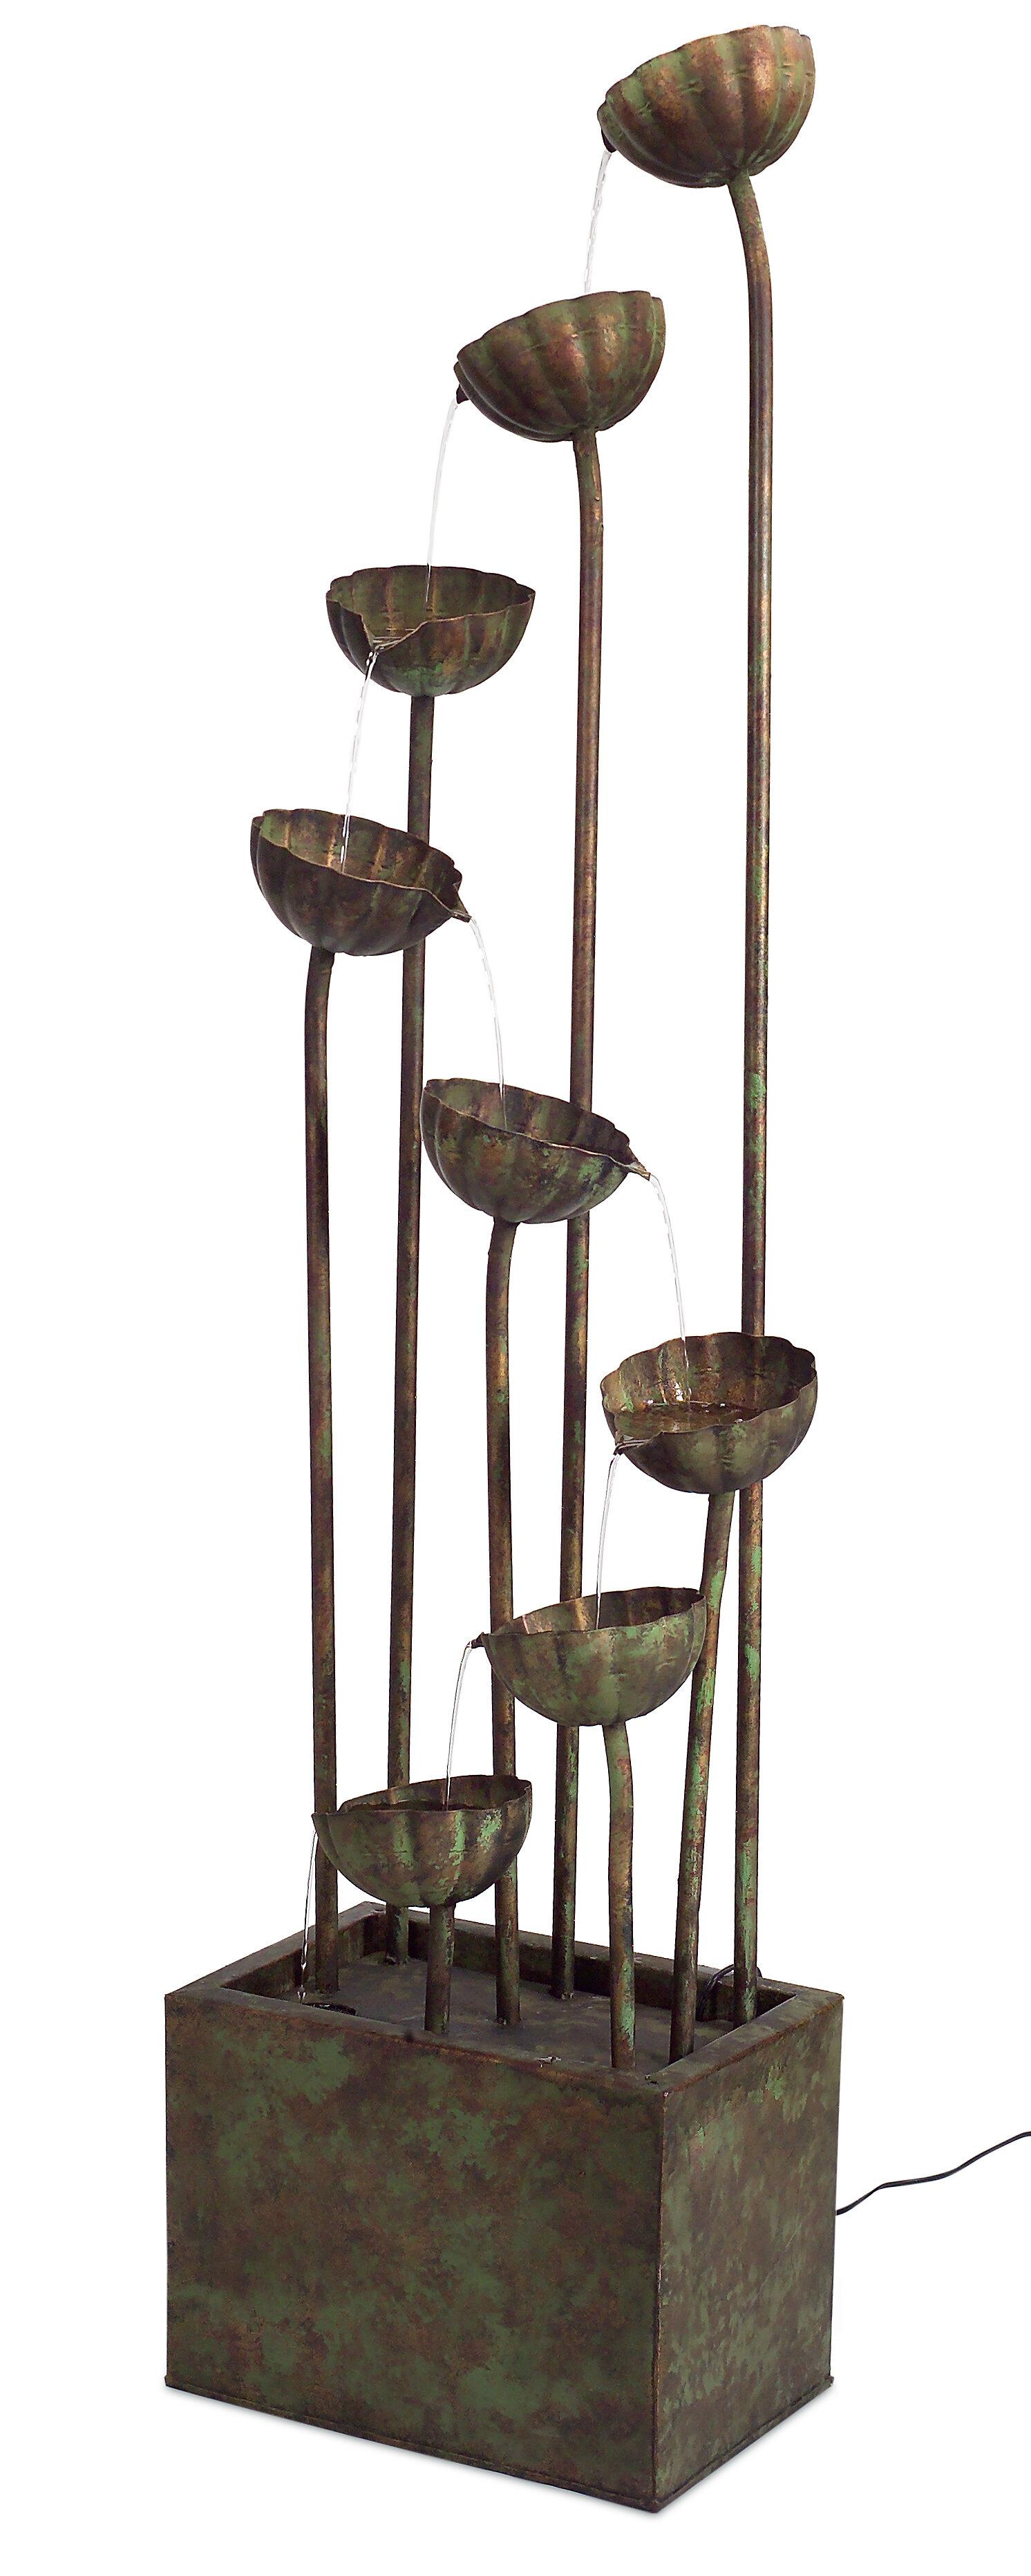 Melrose intl metal flower fountain reviews wayfair izmirmasajfo